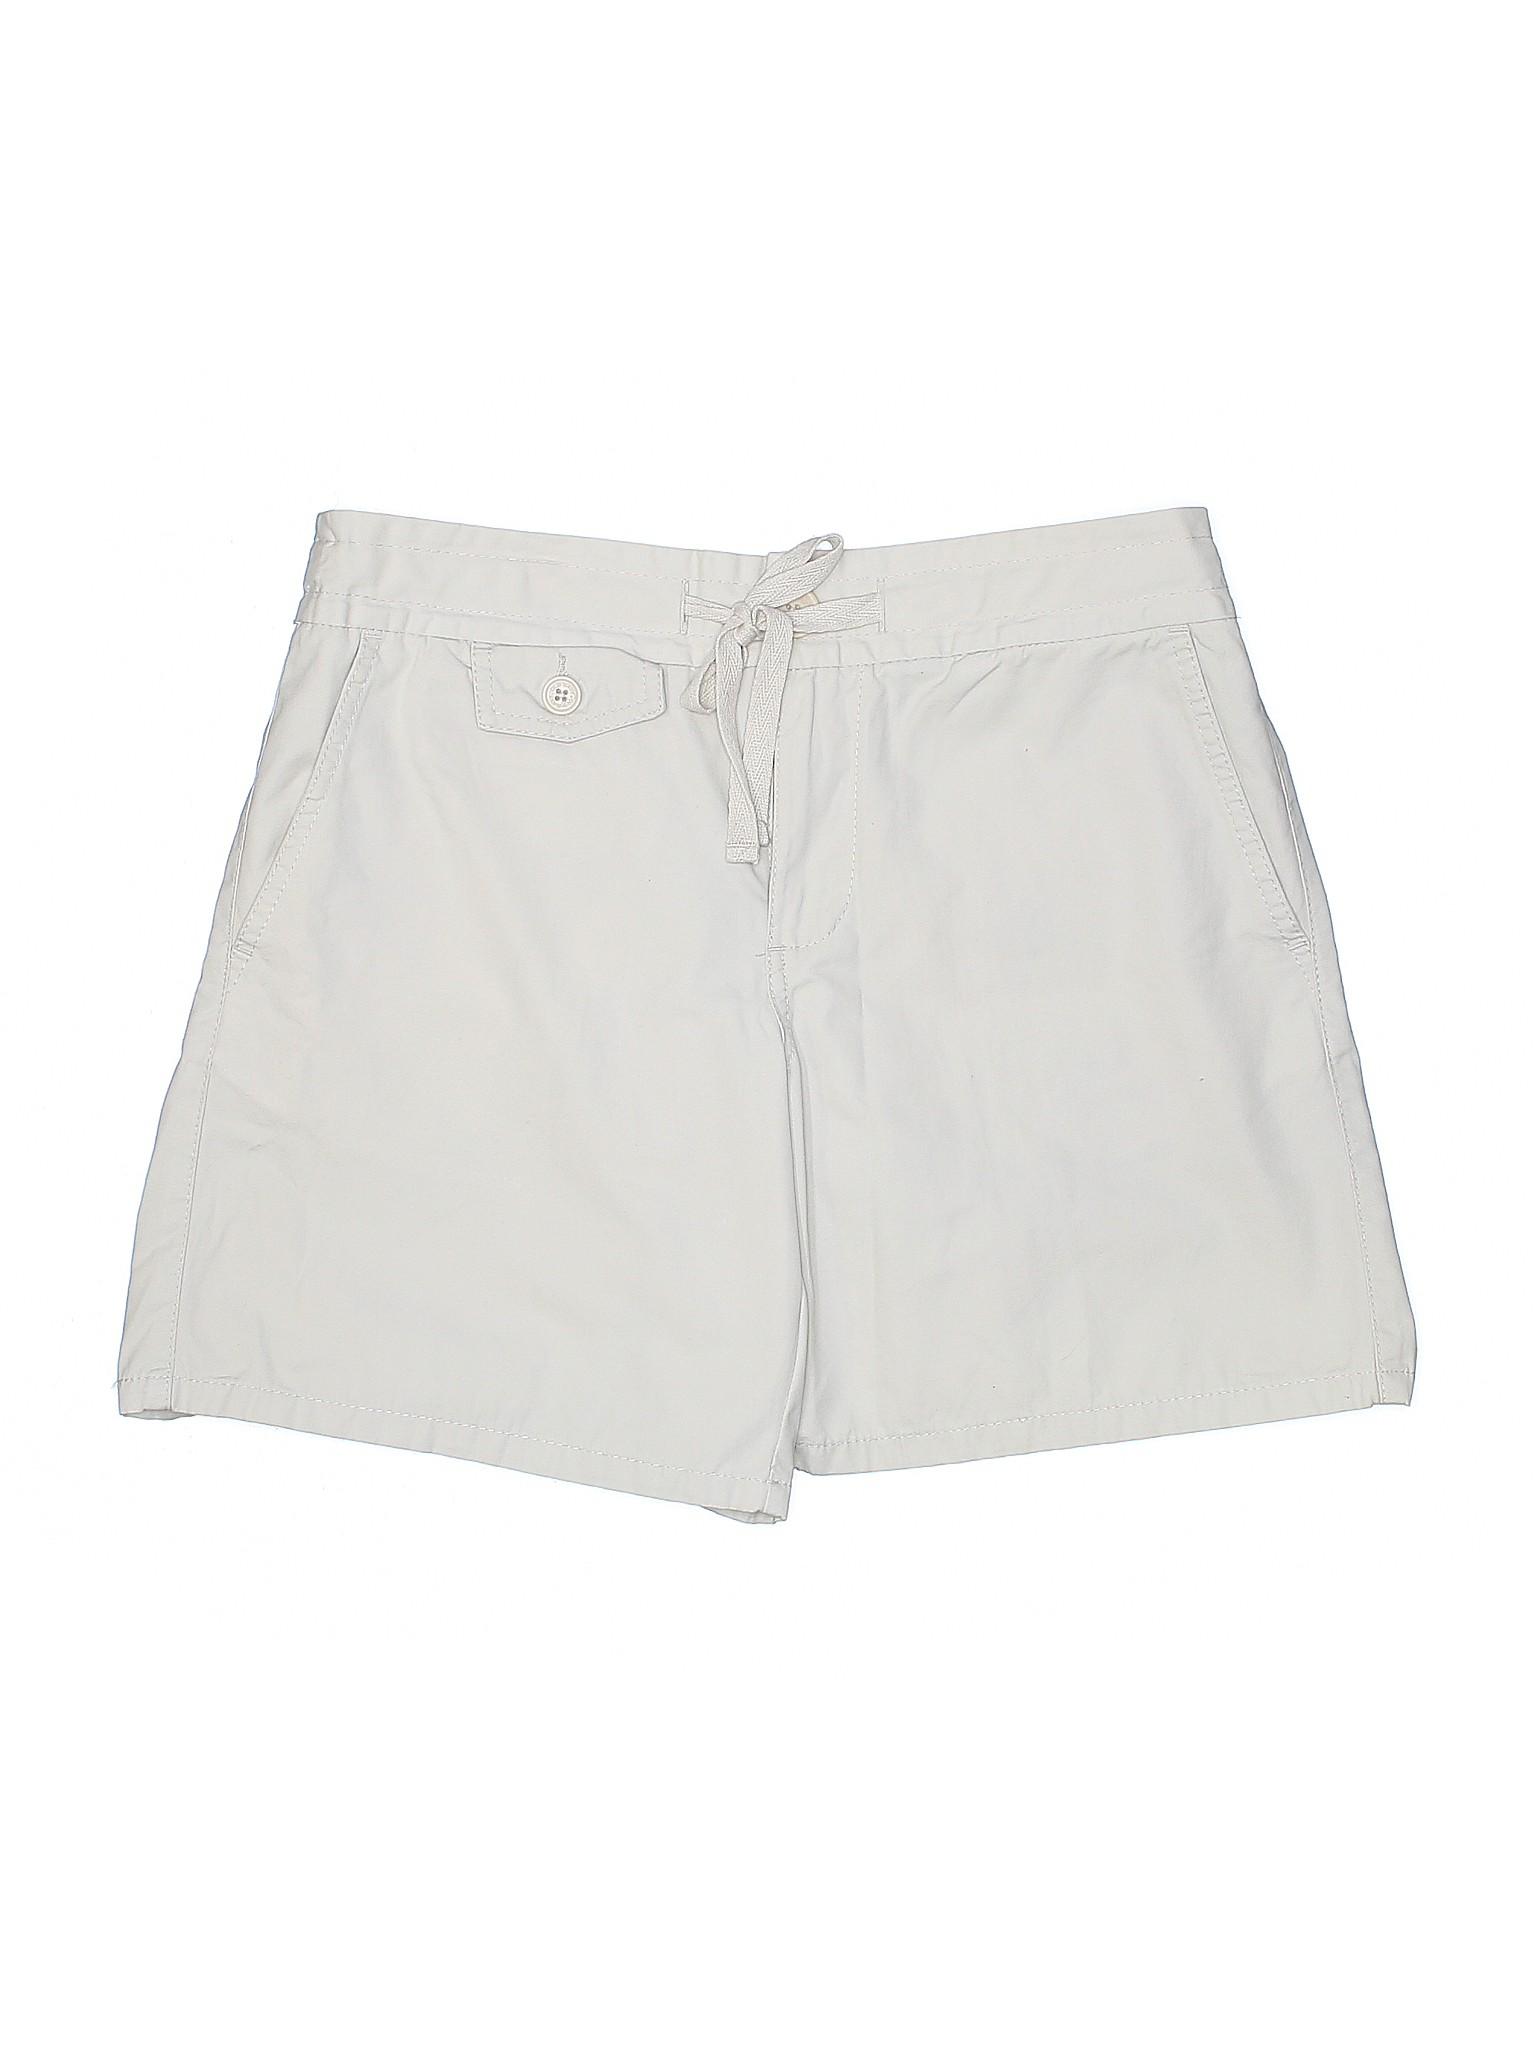 Shorts Boutique Old Navy leisure Khaki x4OSn4wr